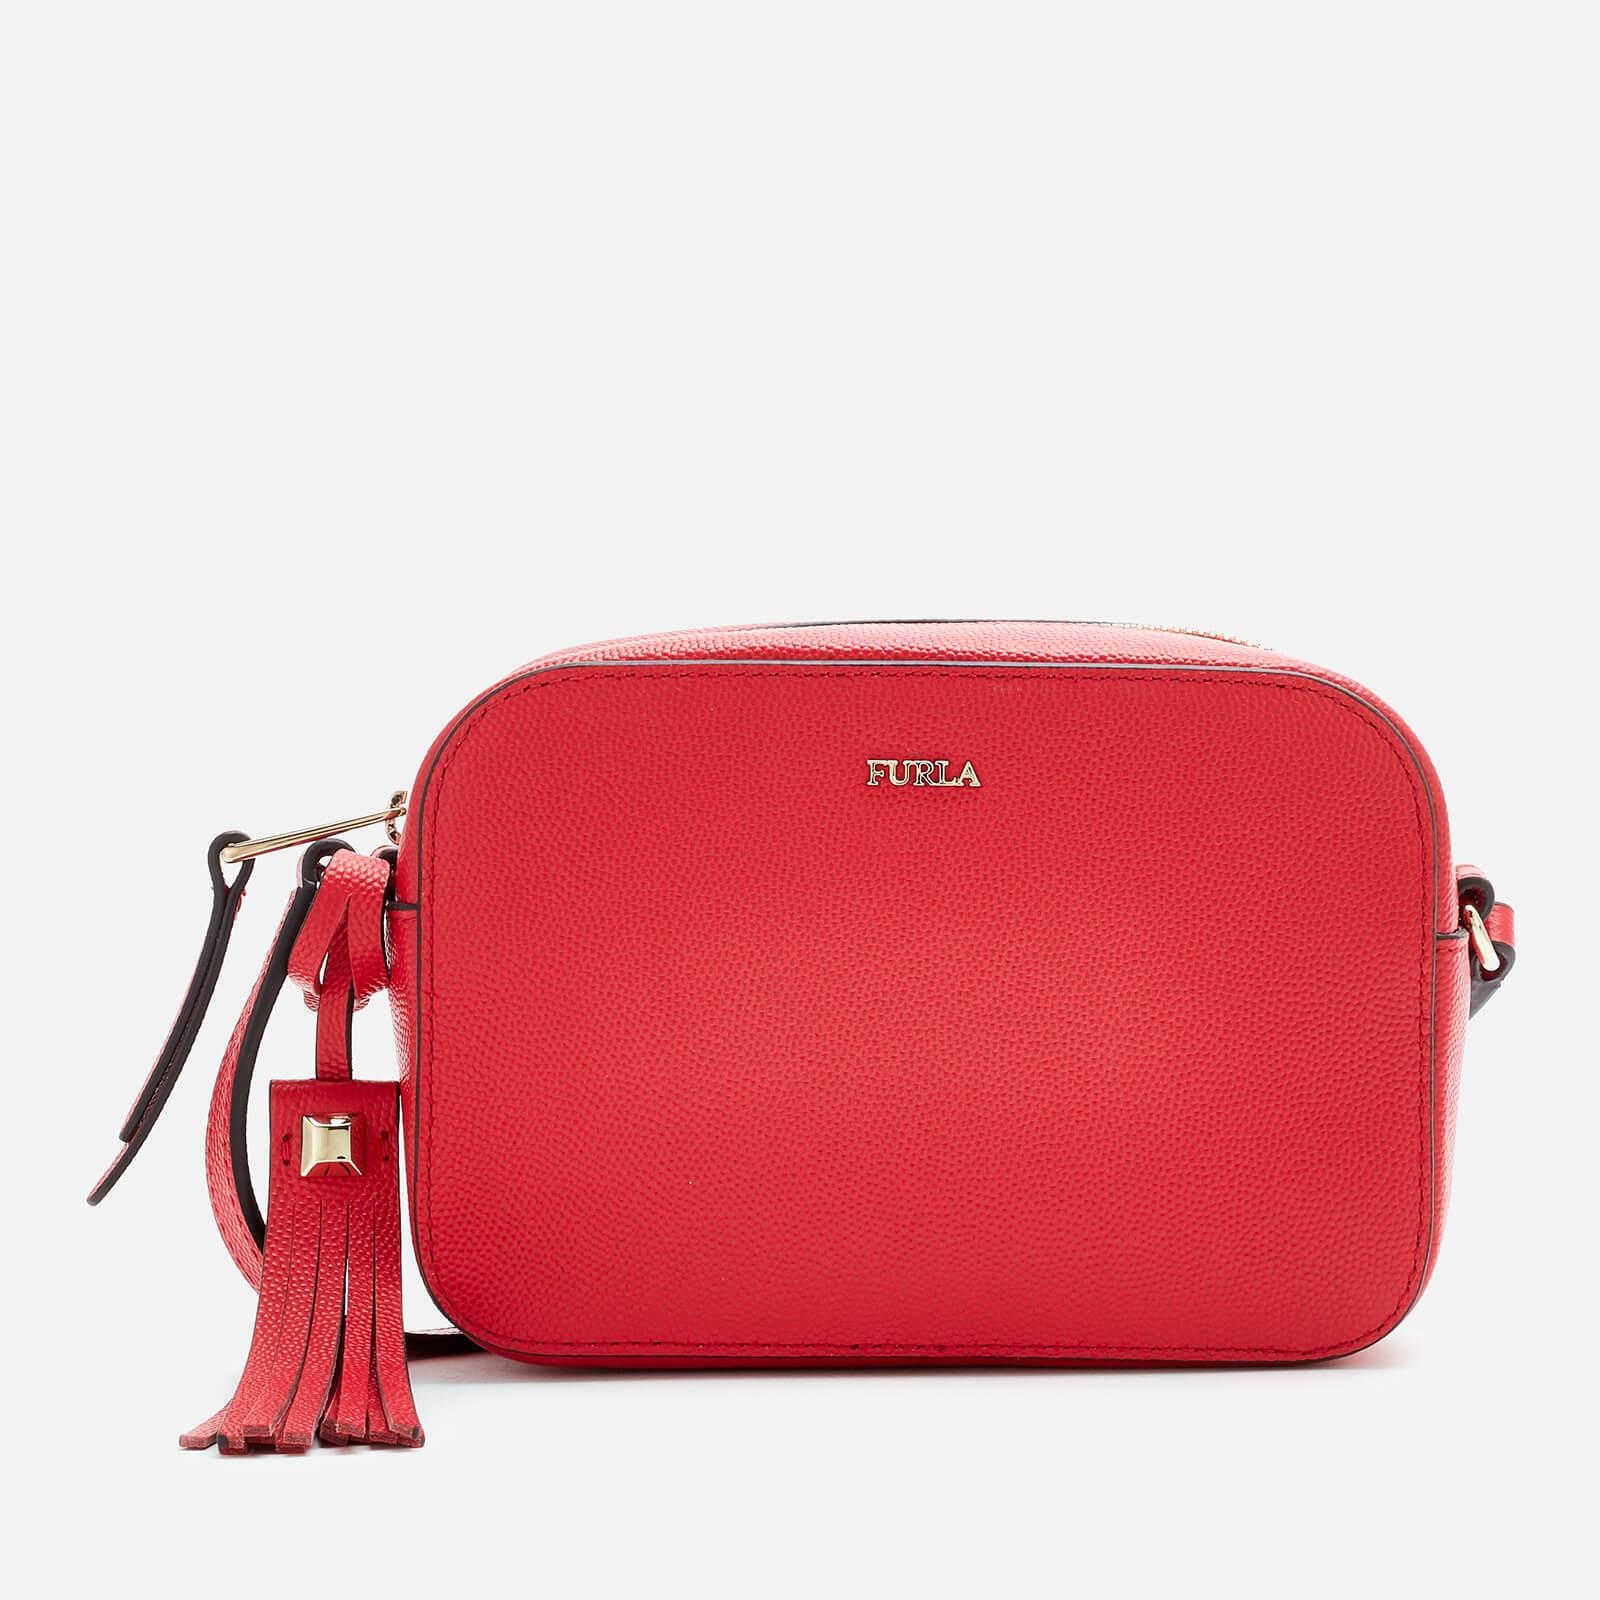 Furla Women's Mimi Mini Cross Body Bag - Pink